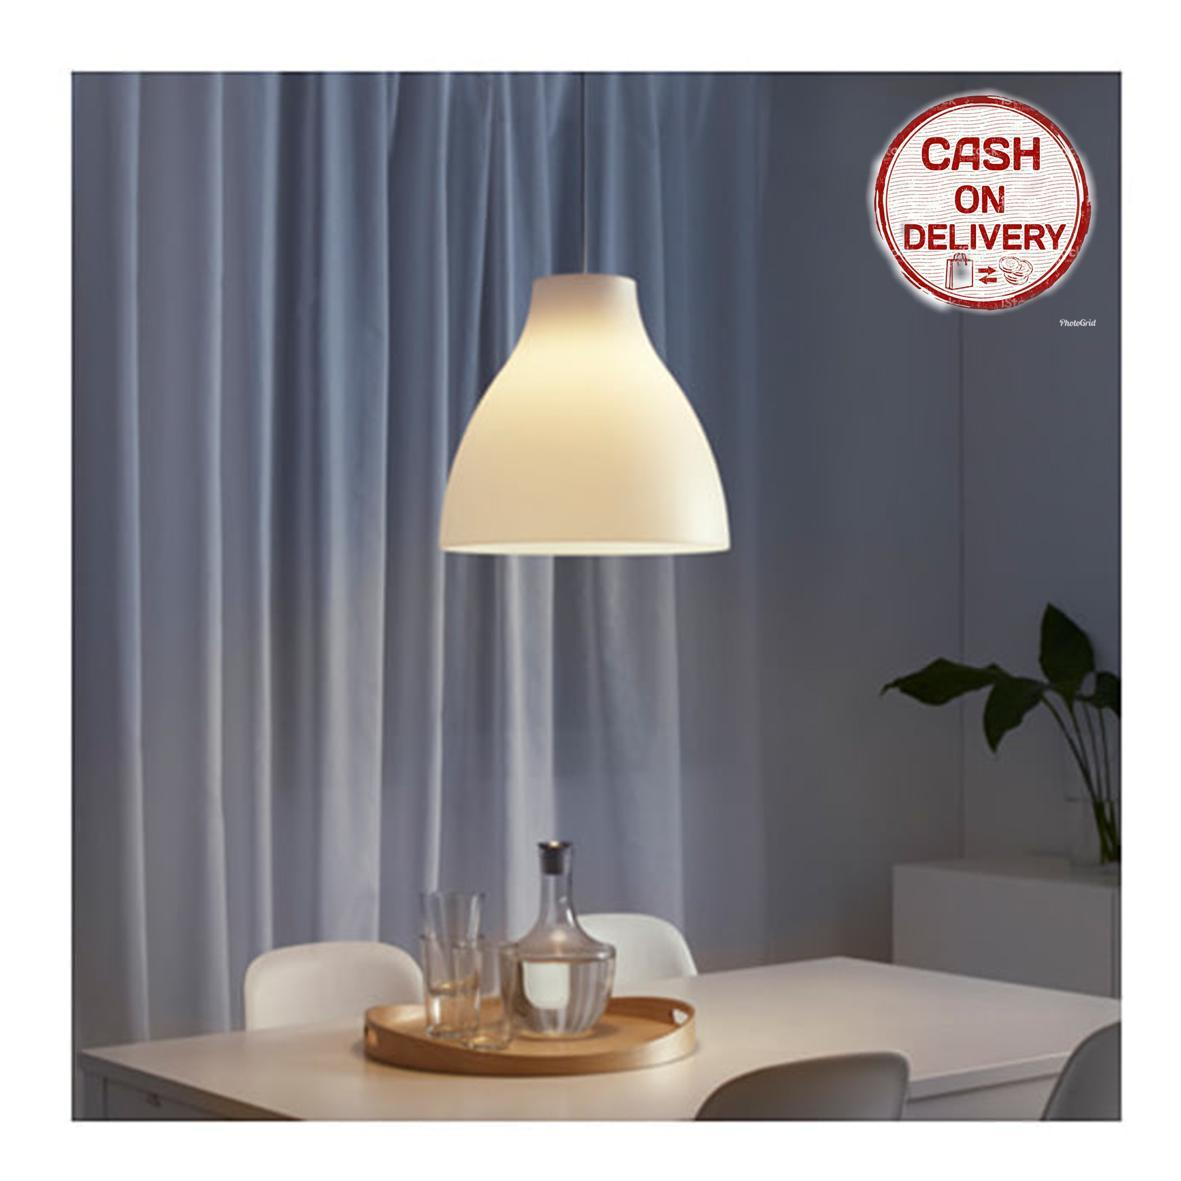 Kado Unik-- Ikea Lampu Gantung Melodi Meja Makan / Lampu Gantung Melodi Minimalis / Lampu Gantung Cantik / Lampu Hias Meja Makan / Lampu Gantung Murah